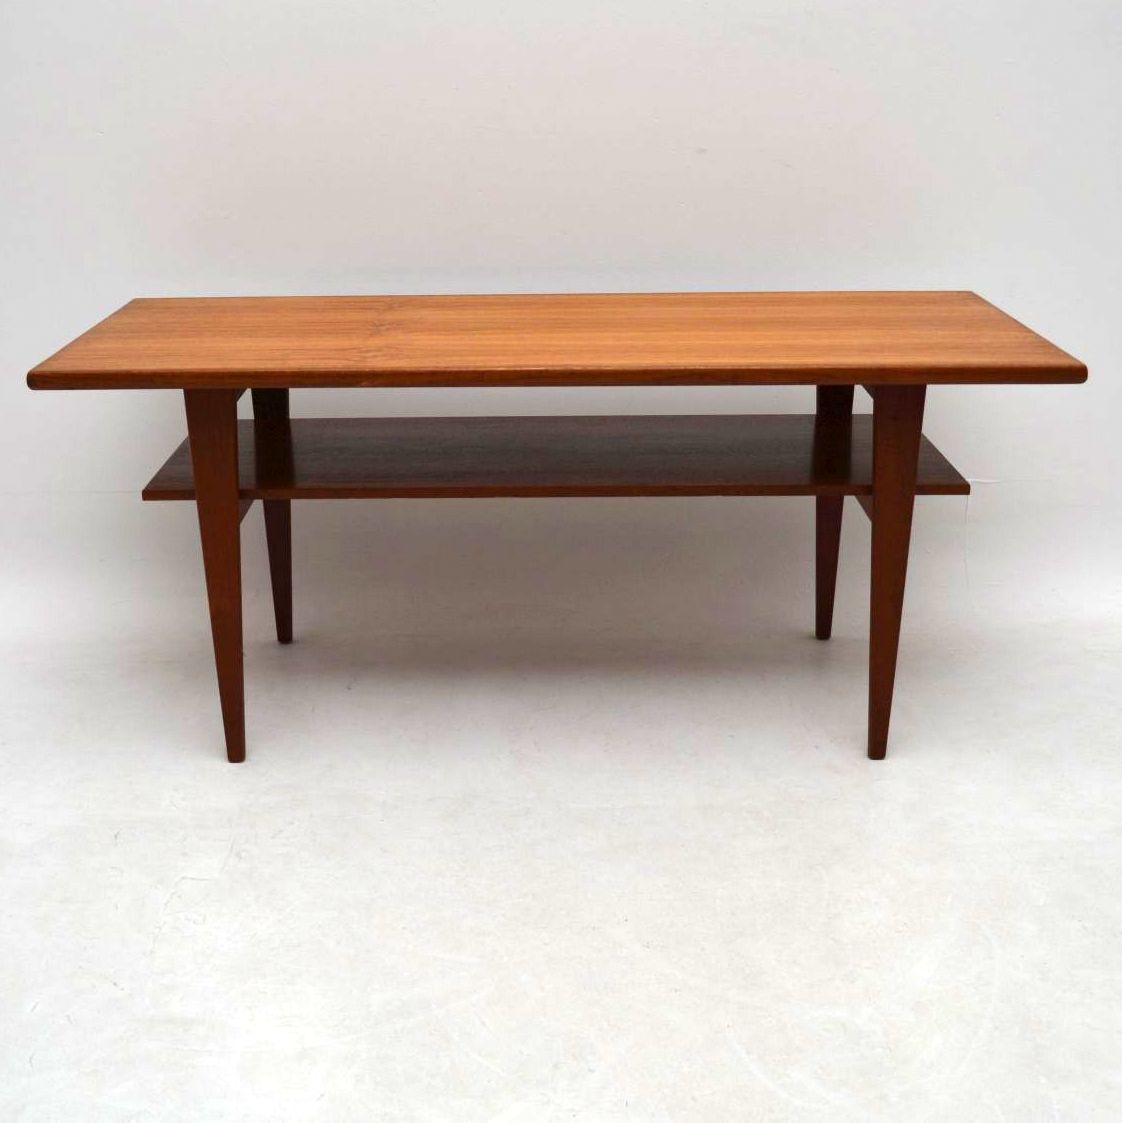 Second Hand Teak Coffee Table: 1960's Danish Teak Coffee Table